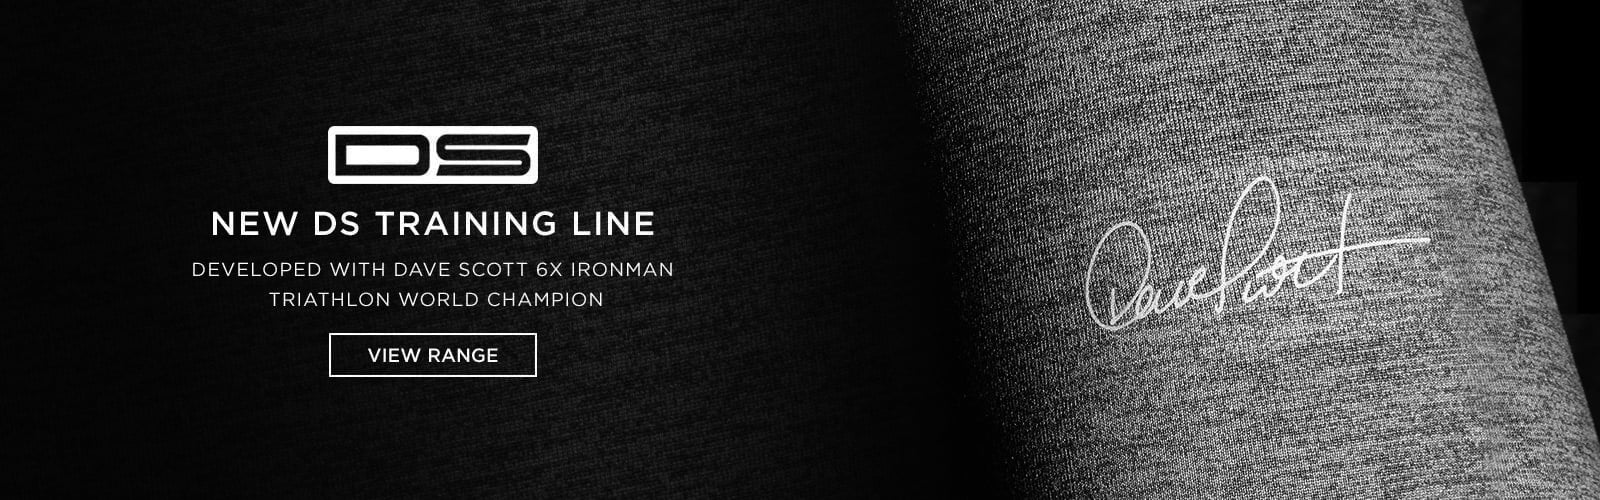 NEW DS TRAINING LINE